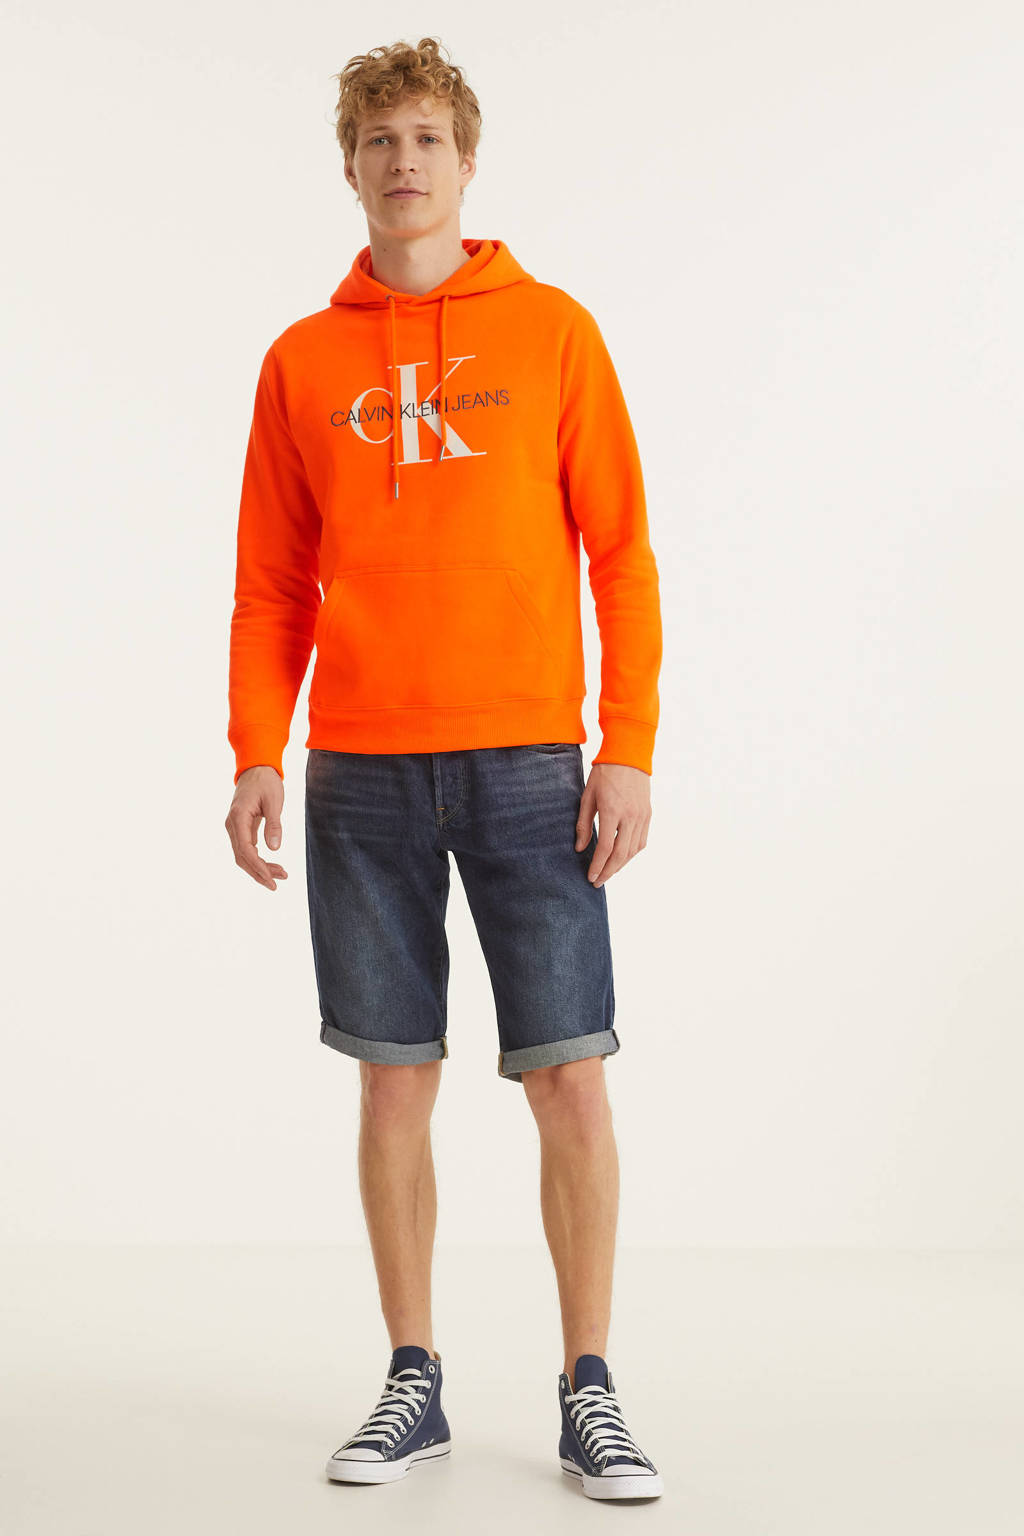 CALVIN KLEIN JEANS hoodie met logo oranje, Oranje